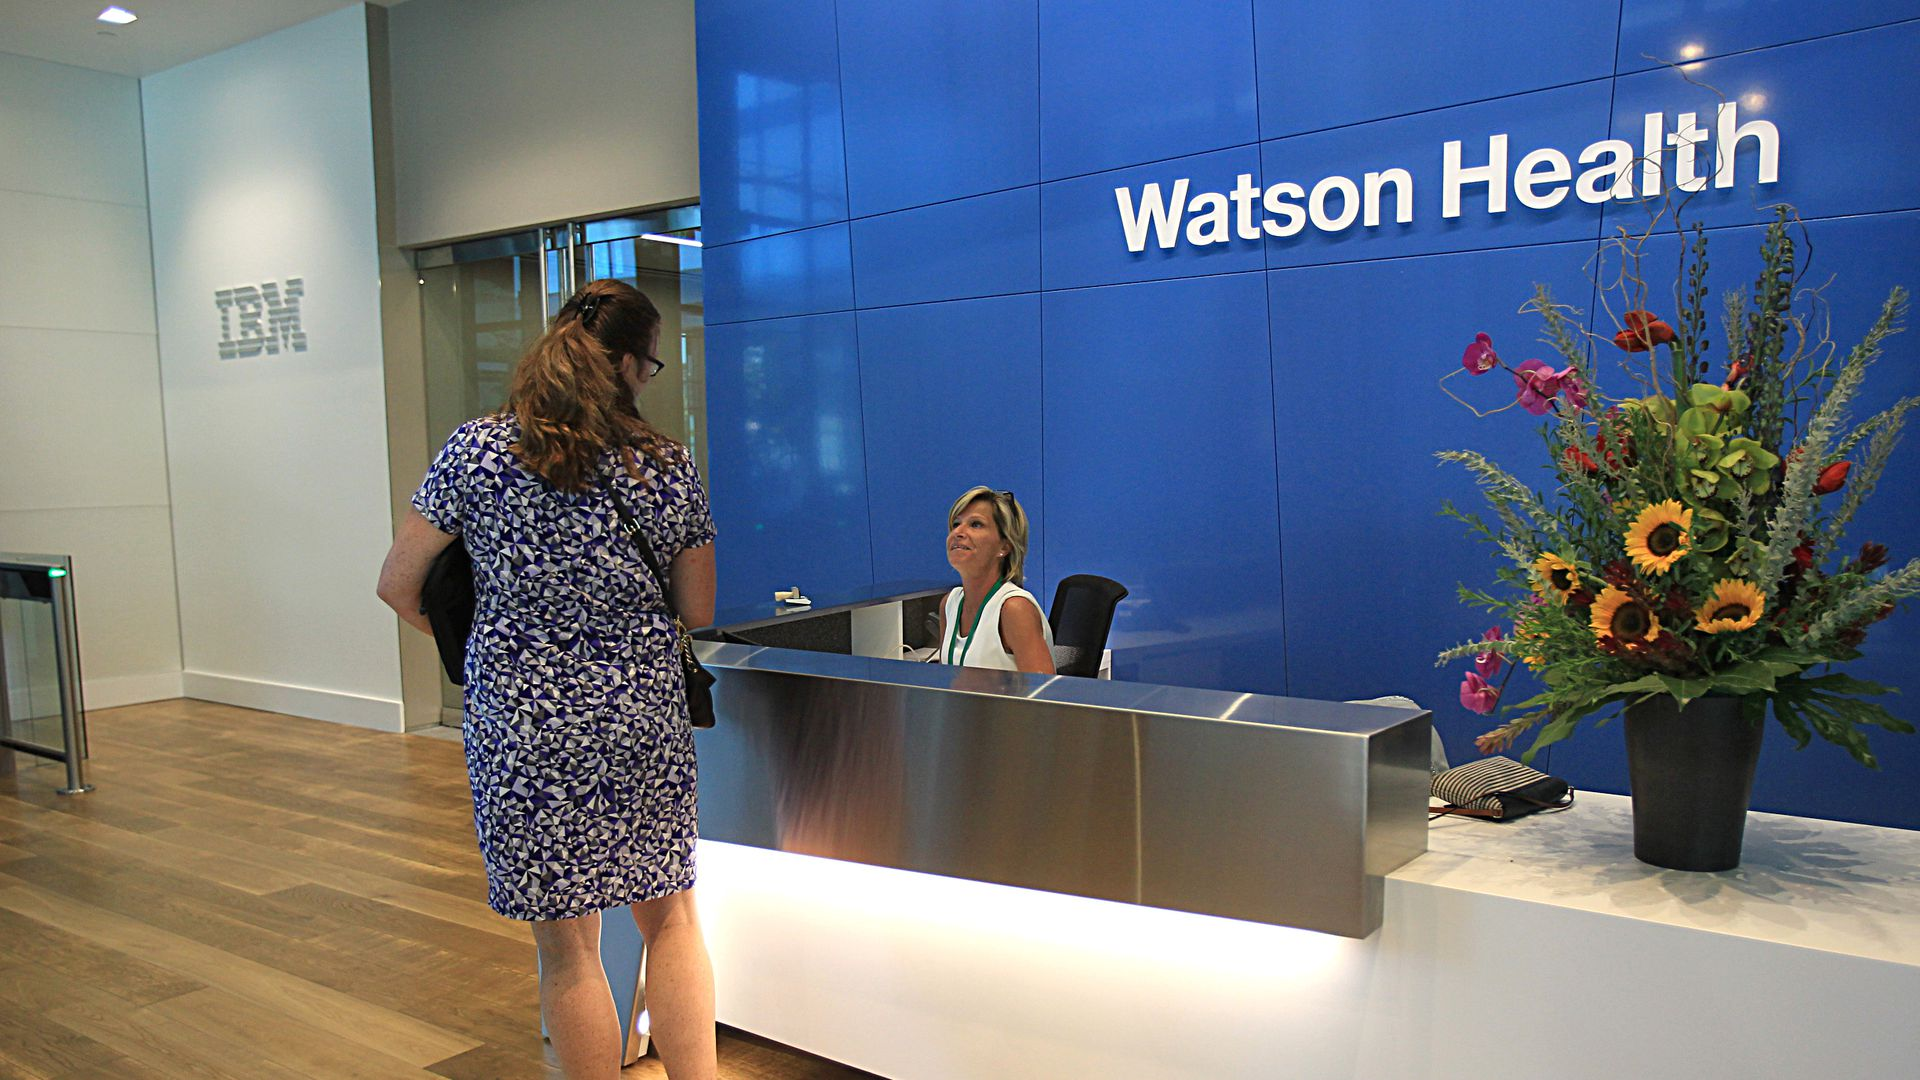 IBM Watson Health confirms layoffs - Axios